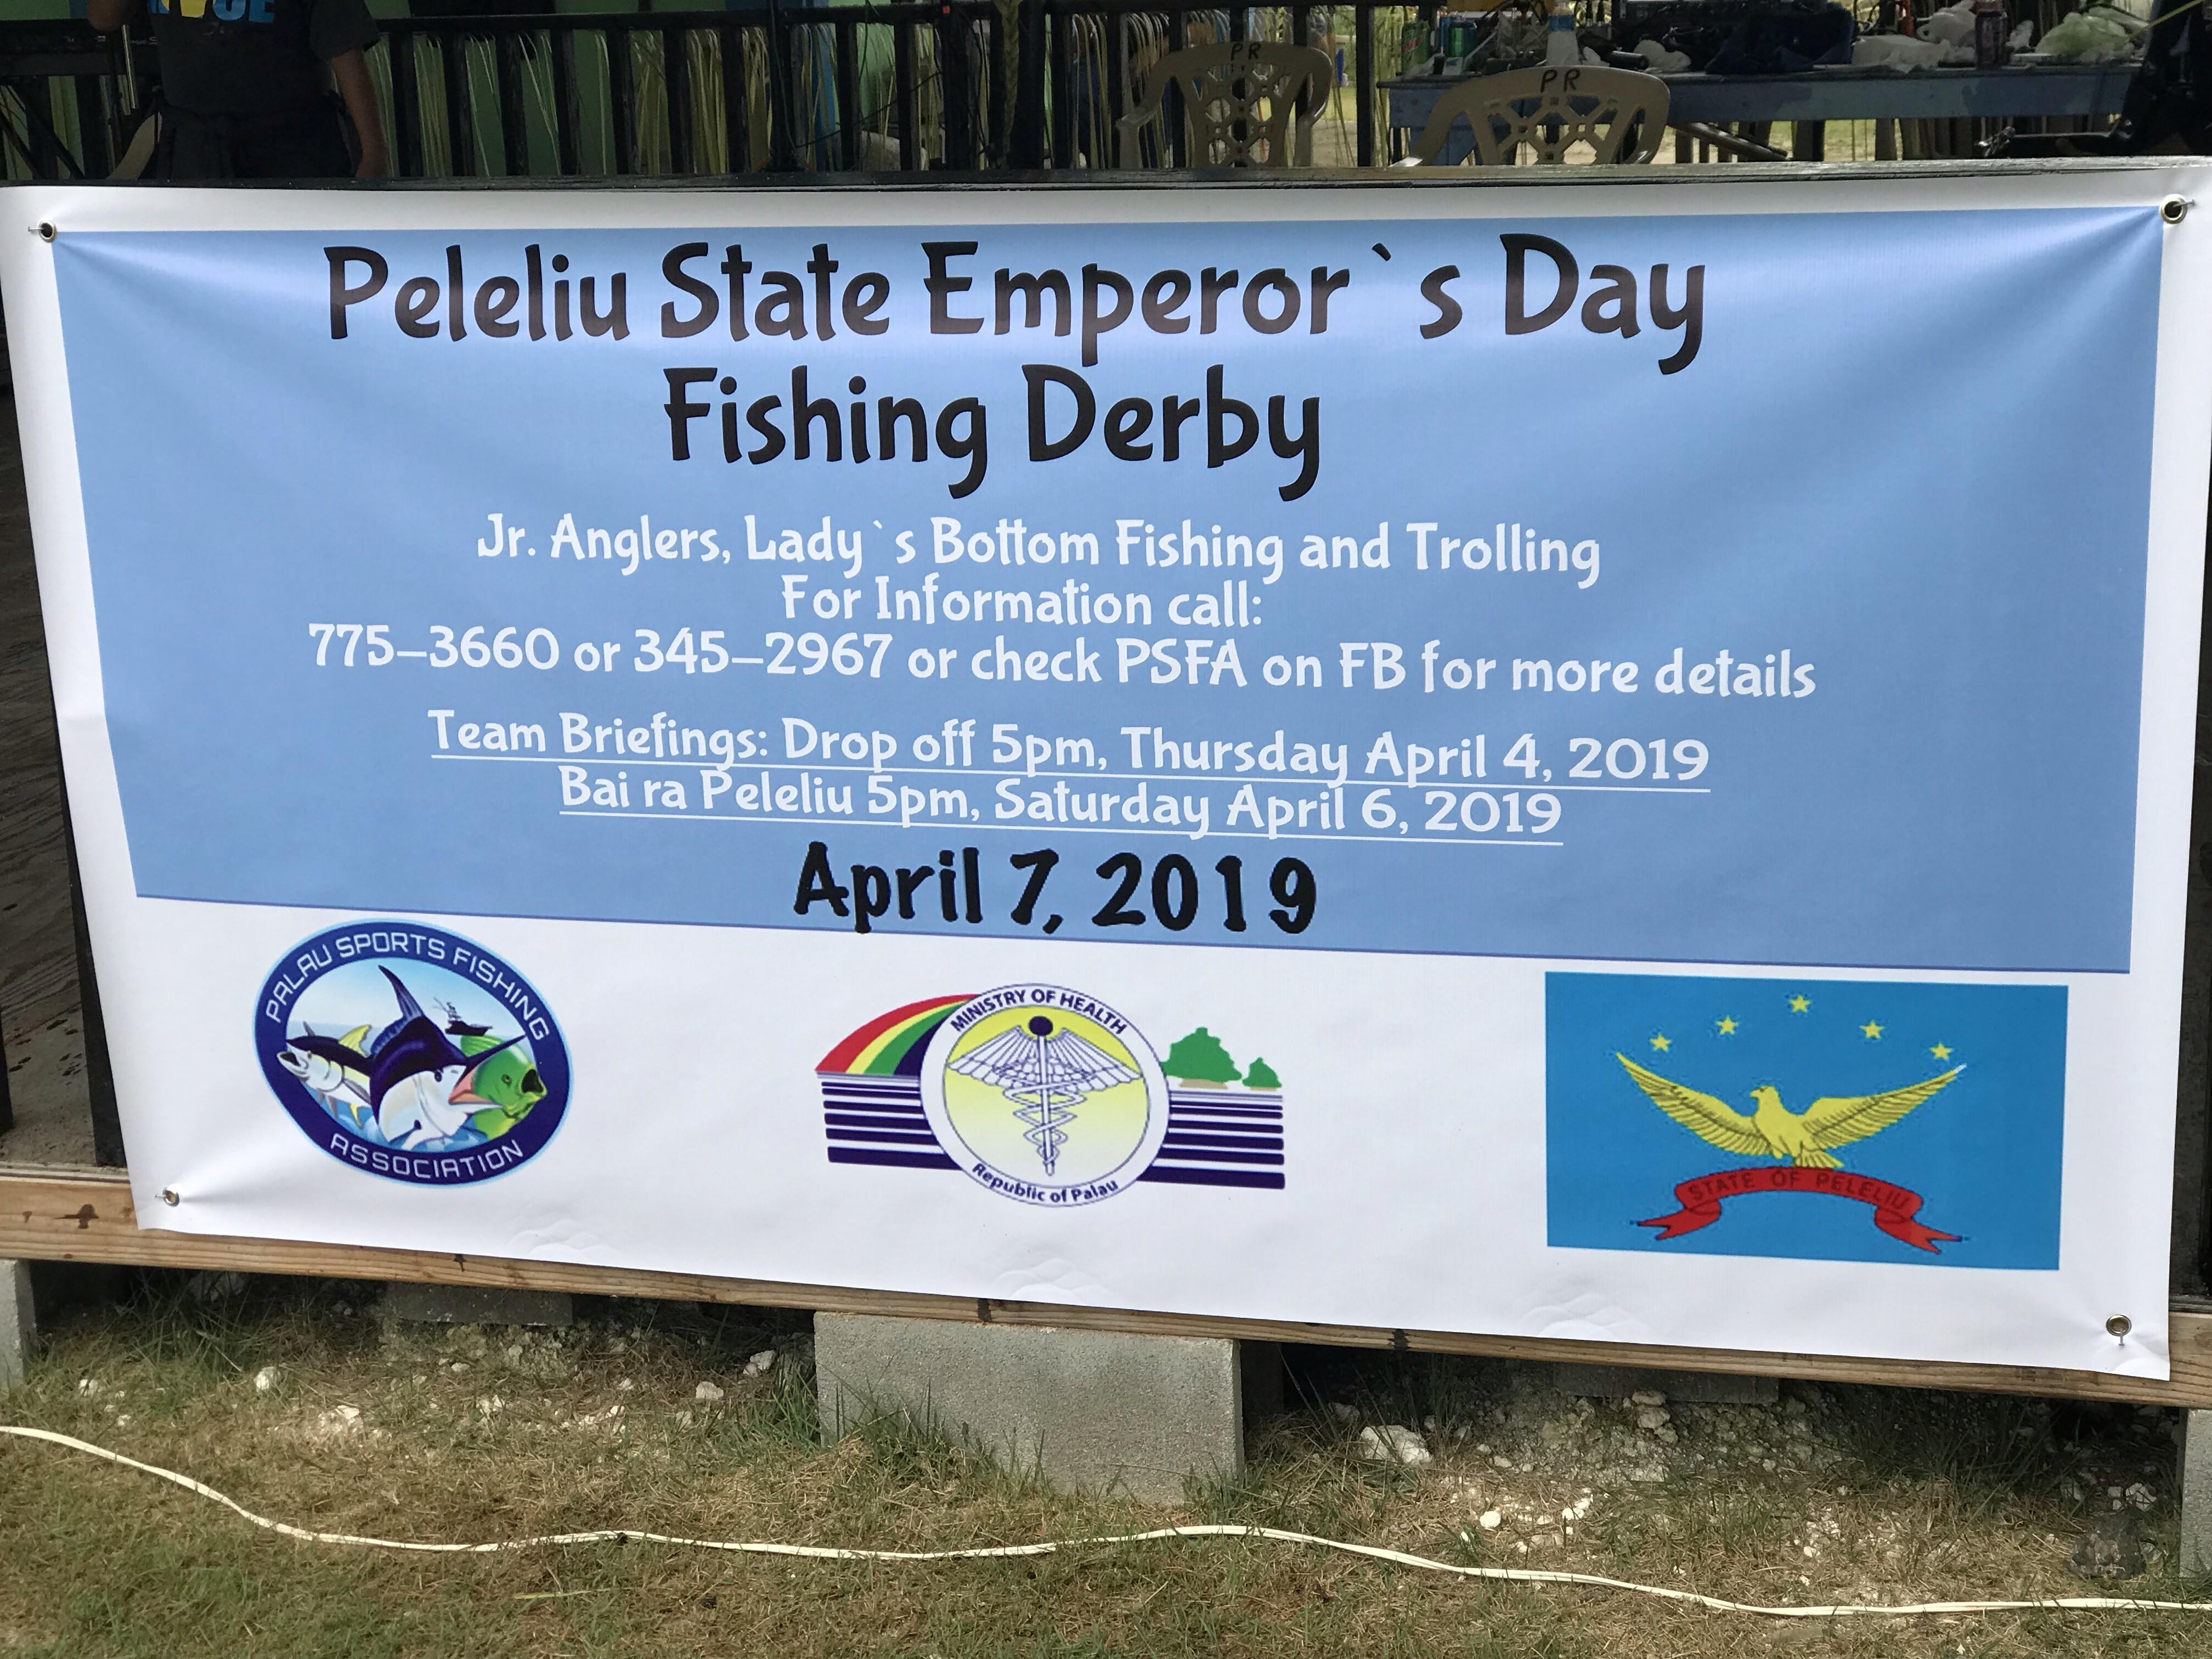 Peleliu Emperor Day